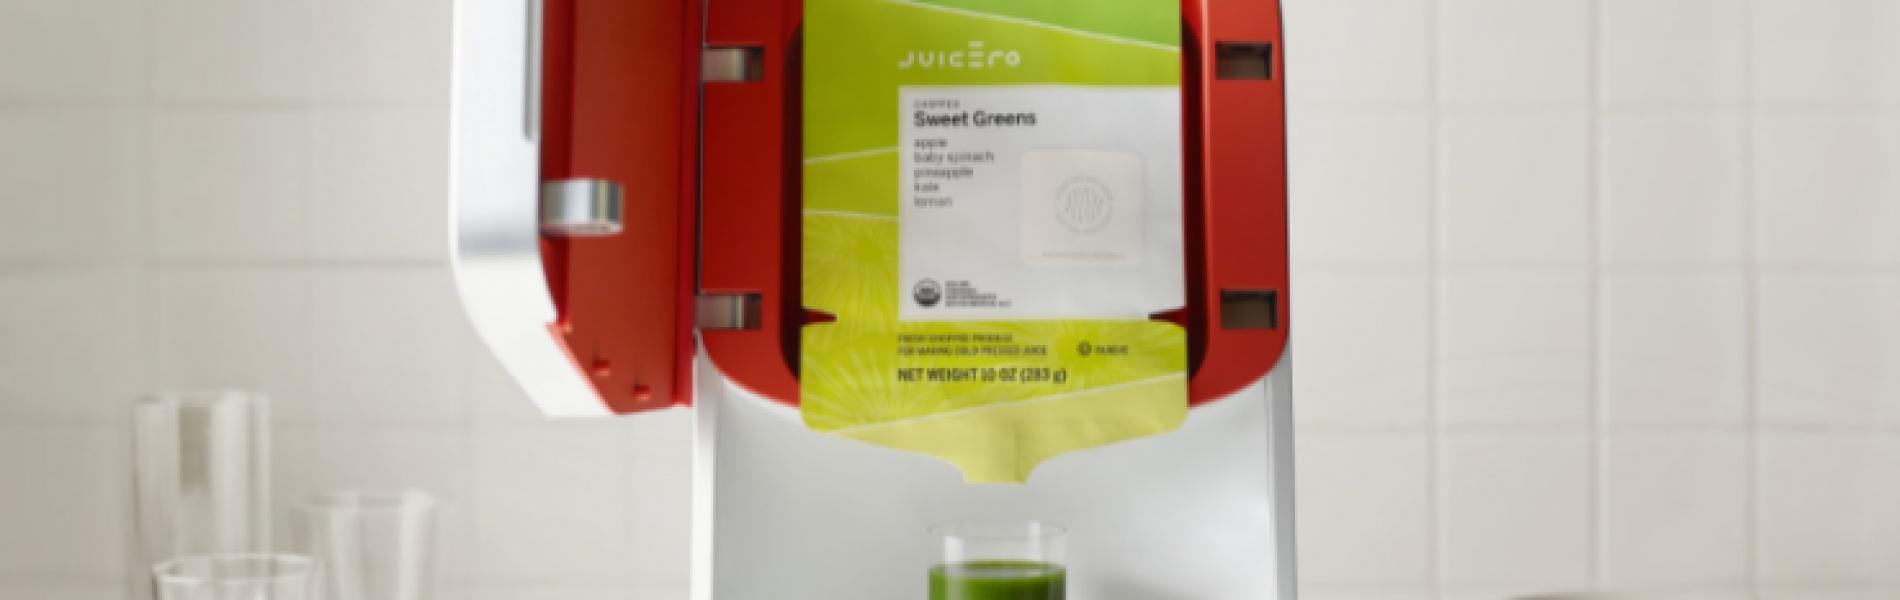 Juicero, the overpriced juicer $350 > $699 >$399 + $$$